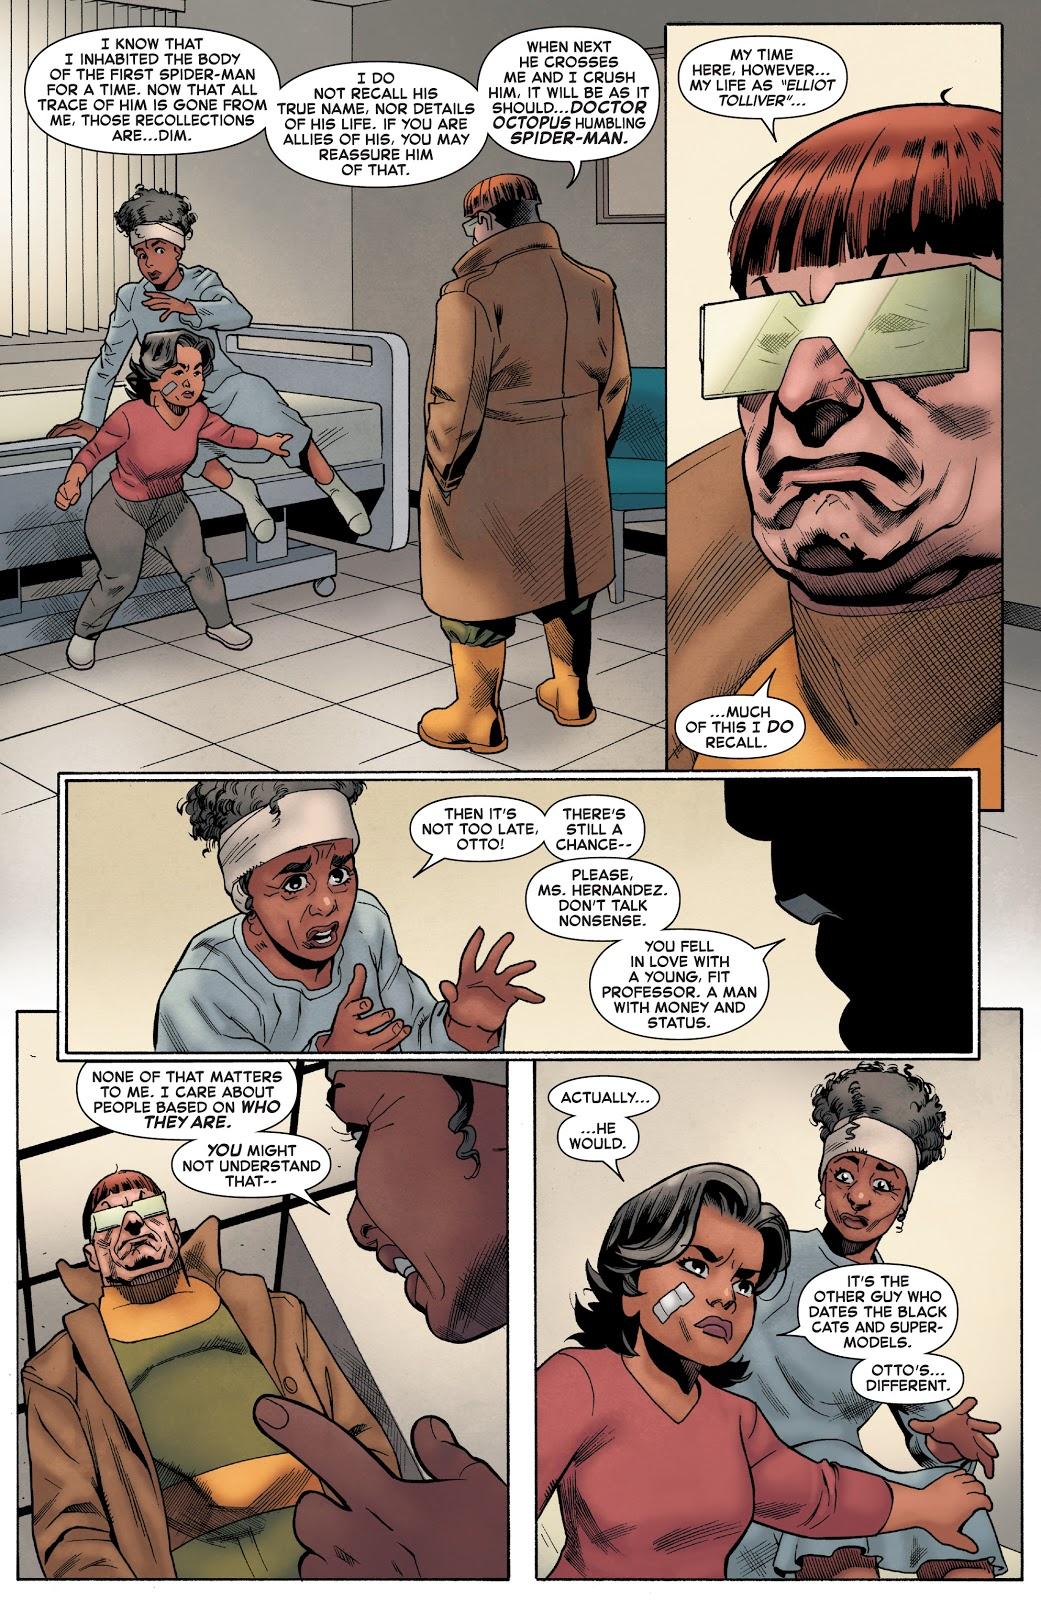 Doctor Octopus Stops Being Superior Spider-Man